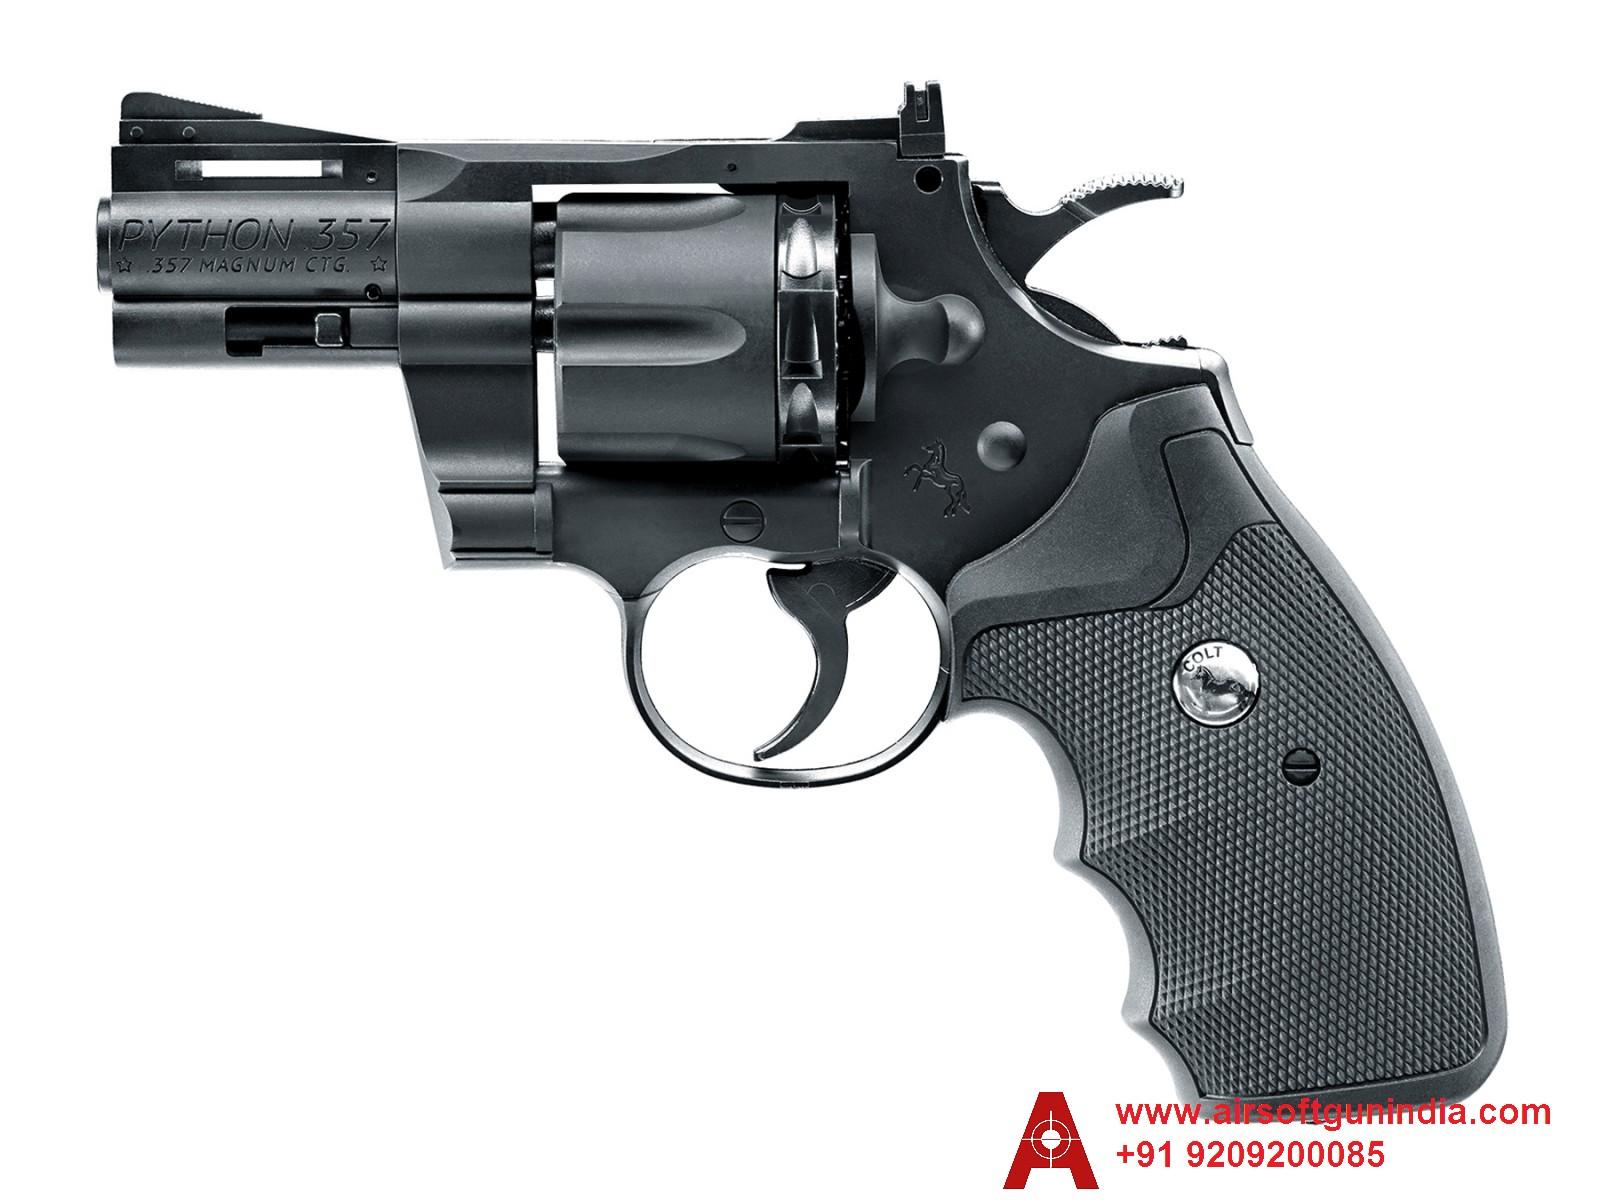 UMAREX Colt Python 357 Pellet And Bb Revolver By Airsoft Gun India